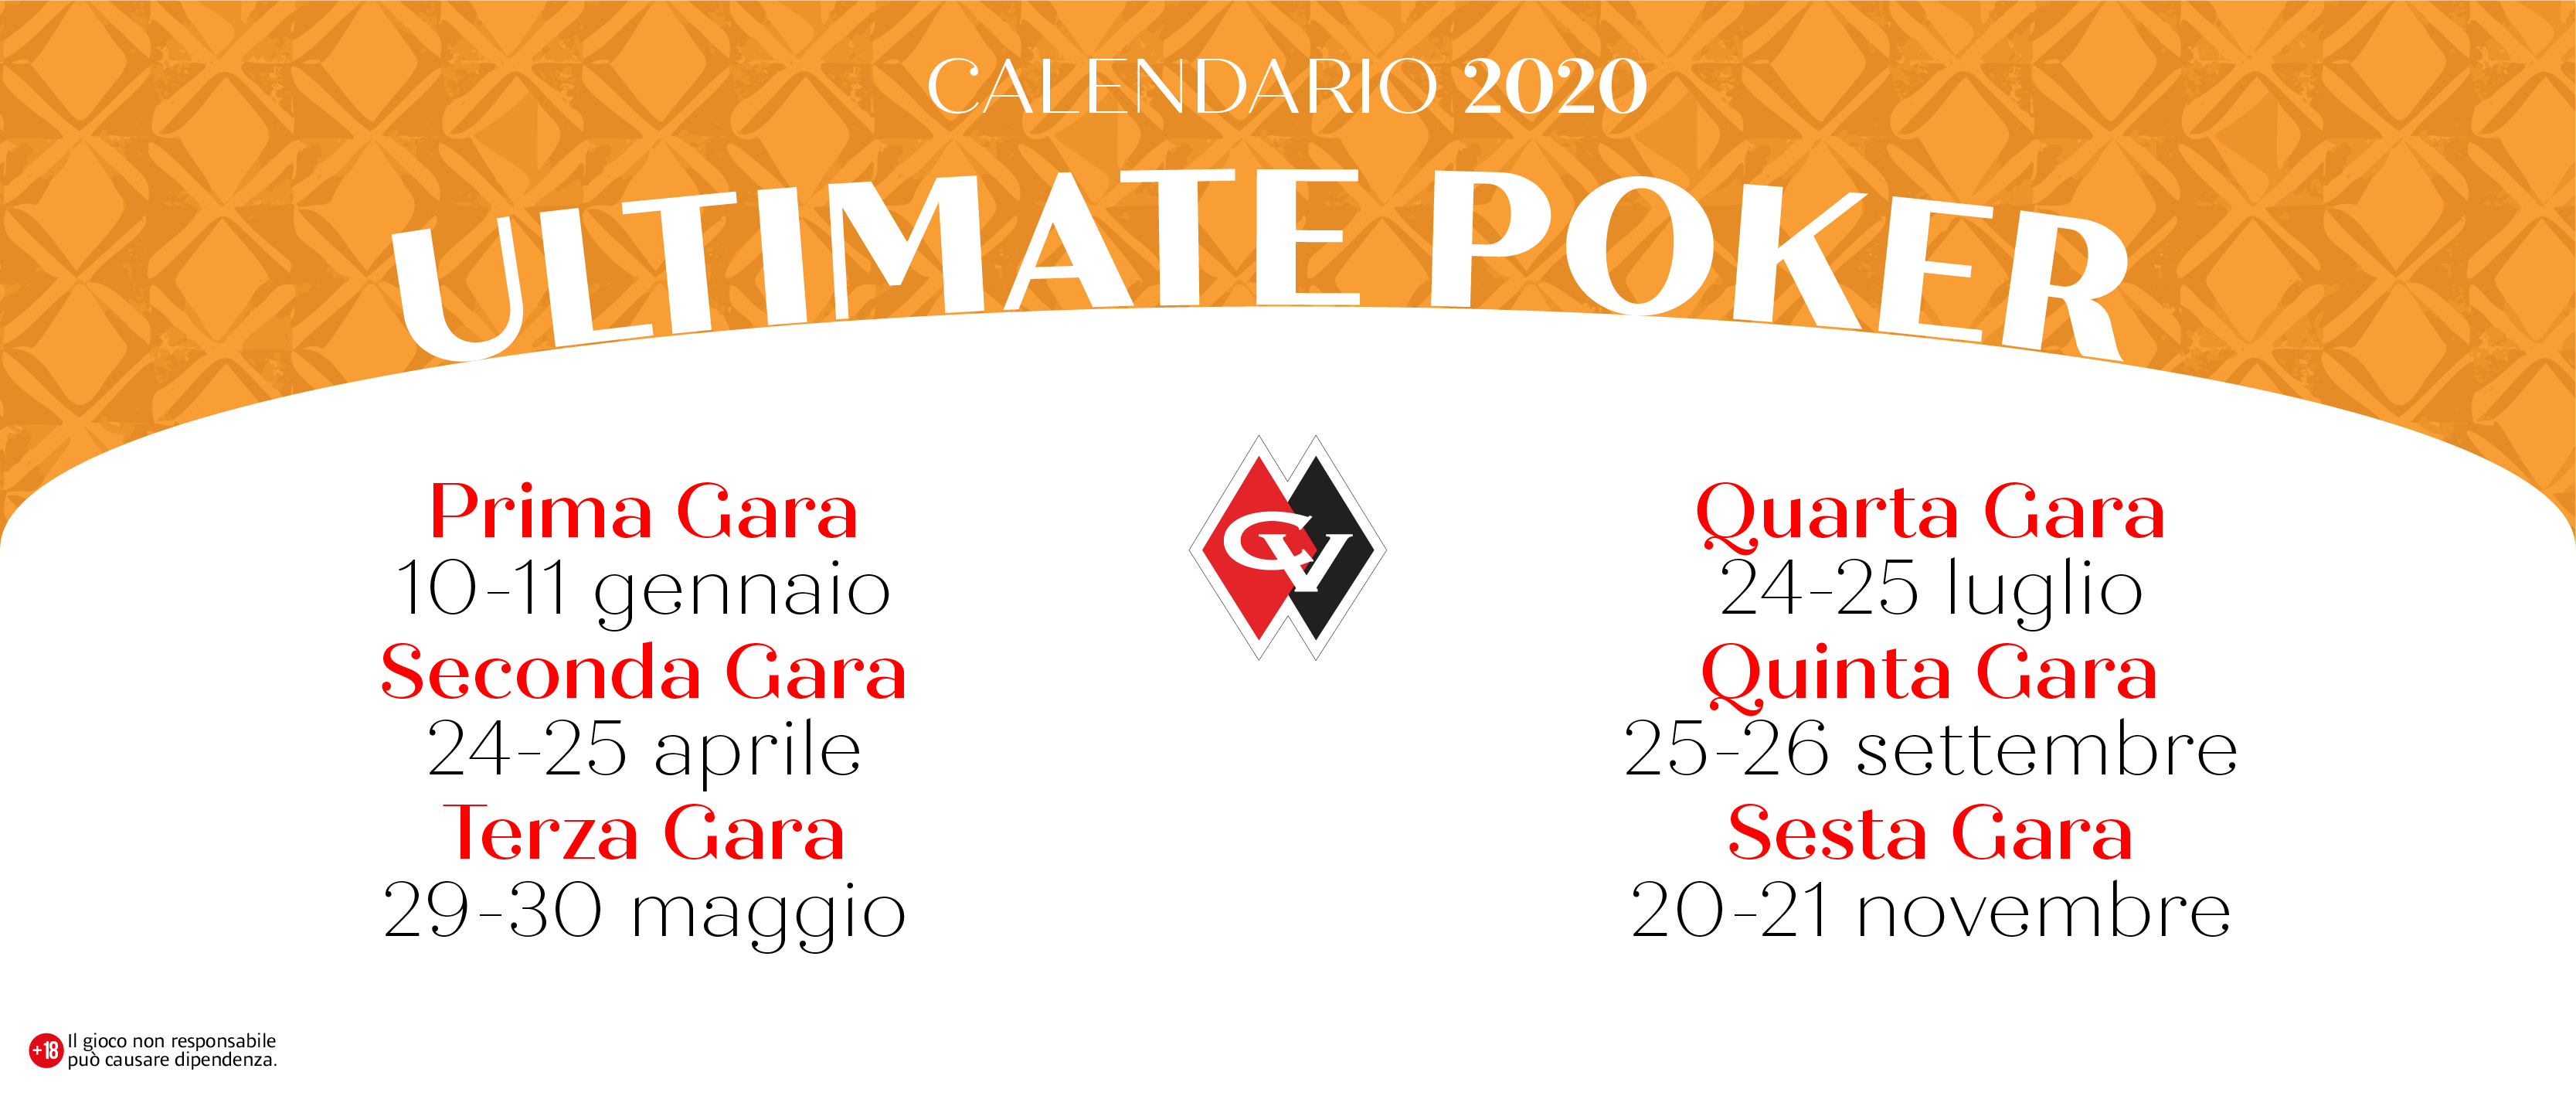 Ultimate Poker 2020